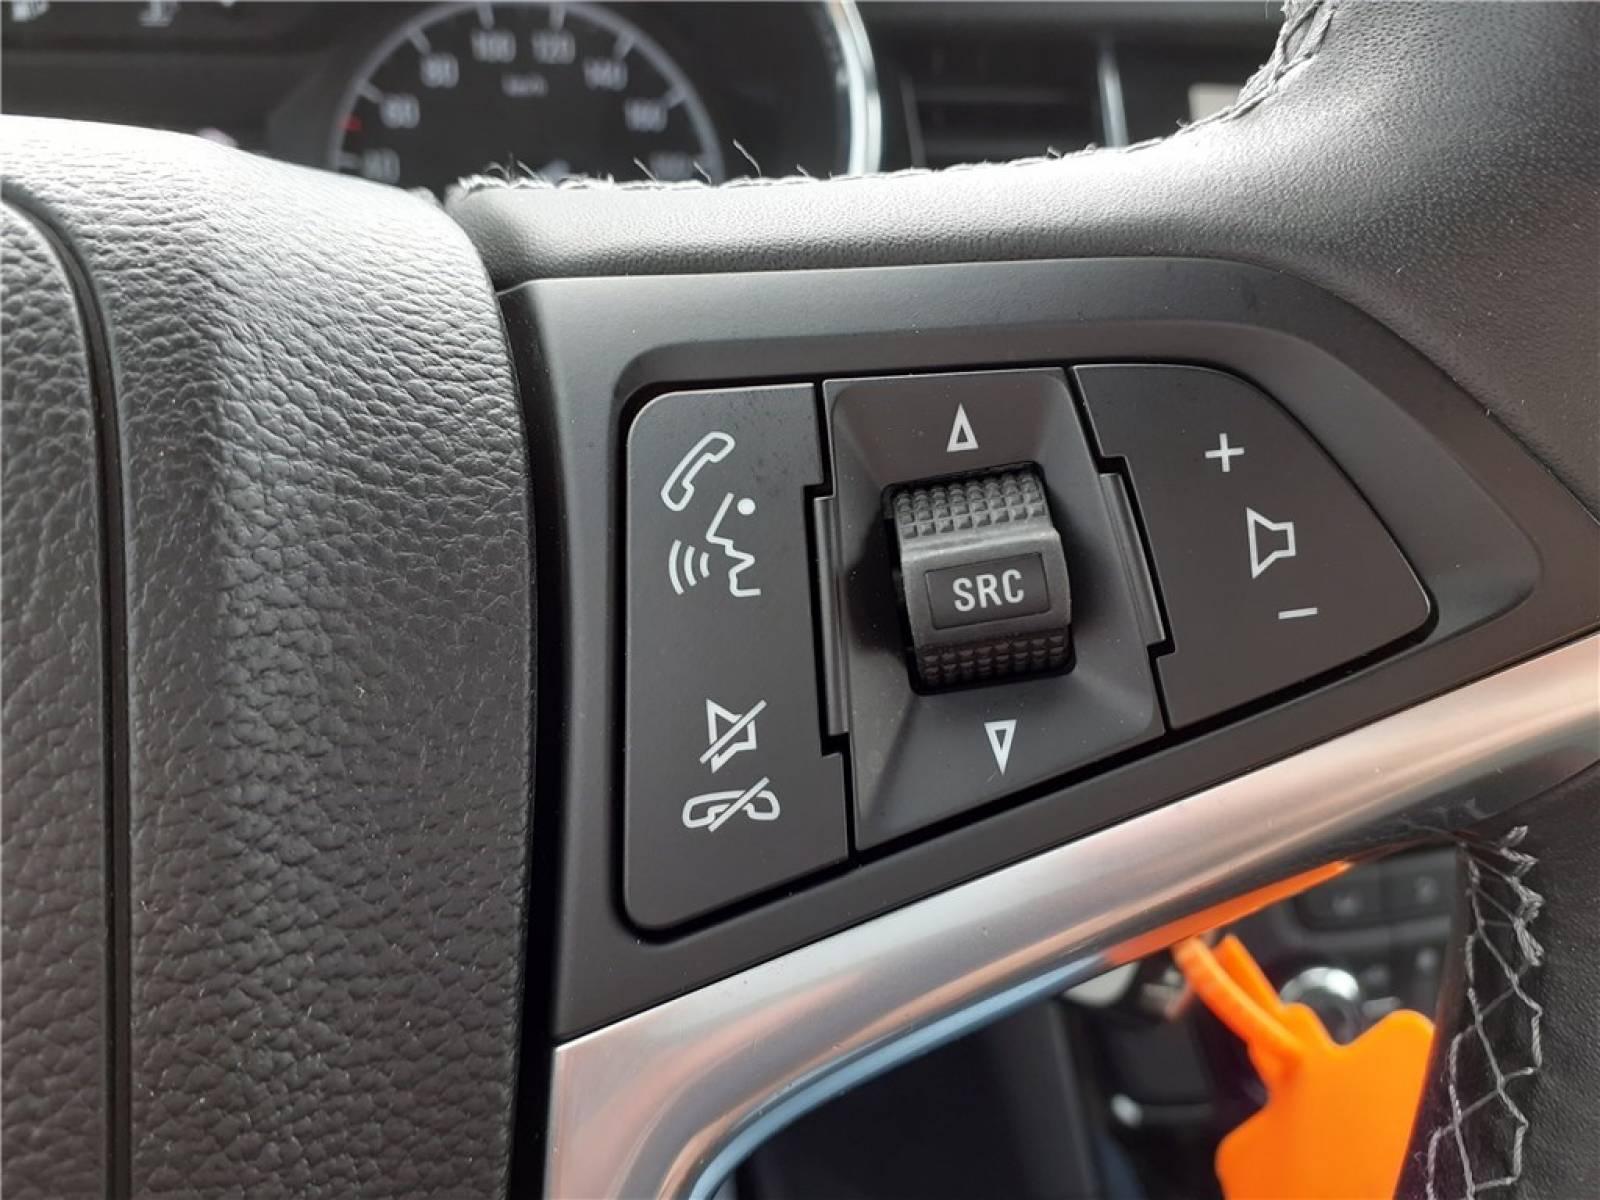 OPEL Mokka X 1.6 CDTI - 136 ch 4x2 - véhicule d'occasion - Groupe Guillet - Opel Magicauto - Chalon-sur-Saône - 71380 - Saint-Marcel - 13